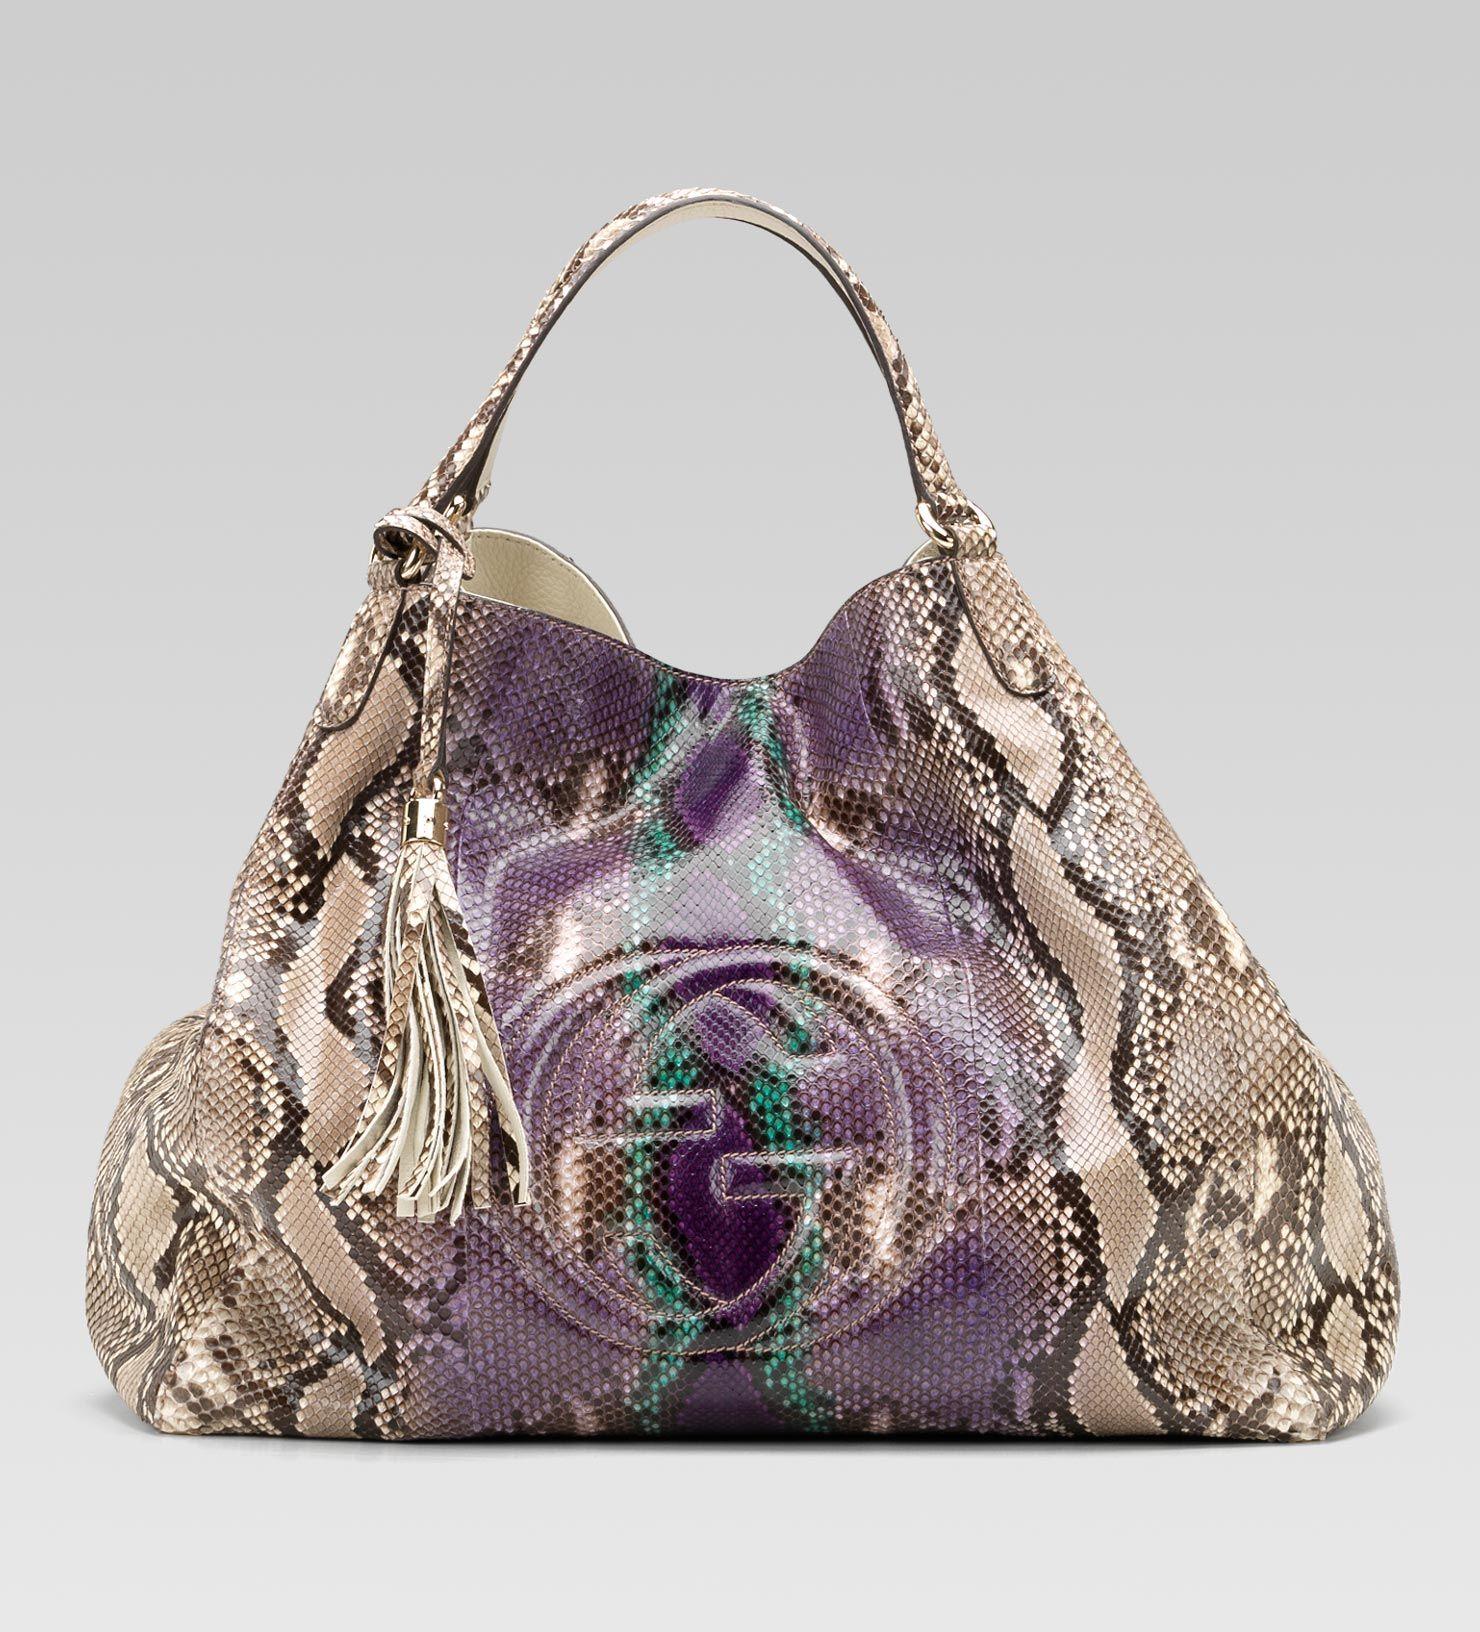 3605501dc13 Gucci  soho  large shoulder bag in grape multi-color python  soho  large  shoulder bag with embossed interlocking G and tassels grape multi-color  pytho